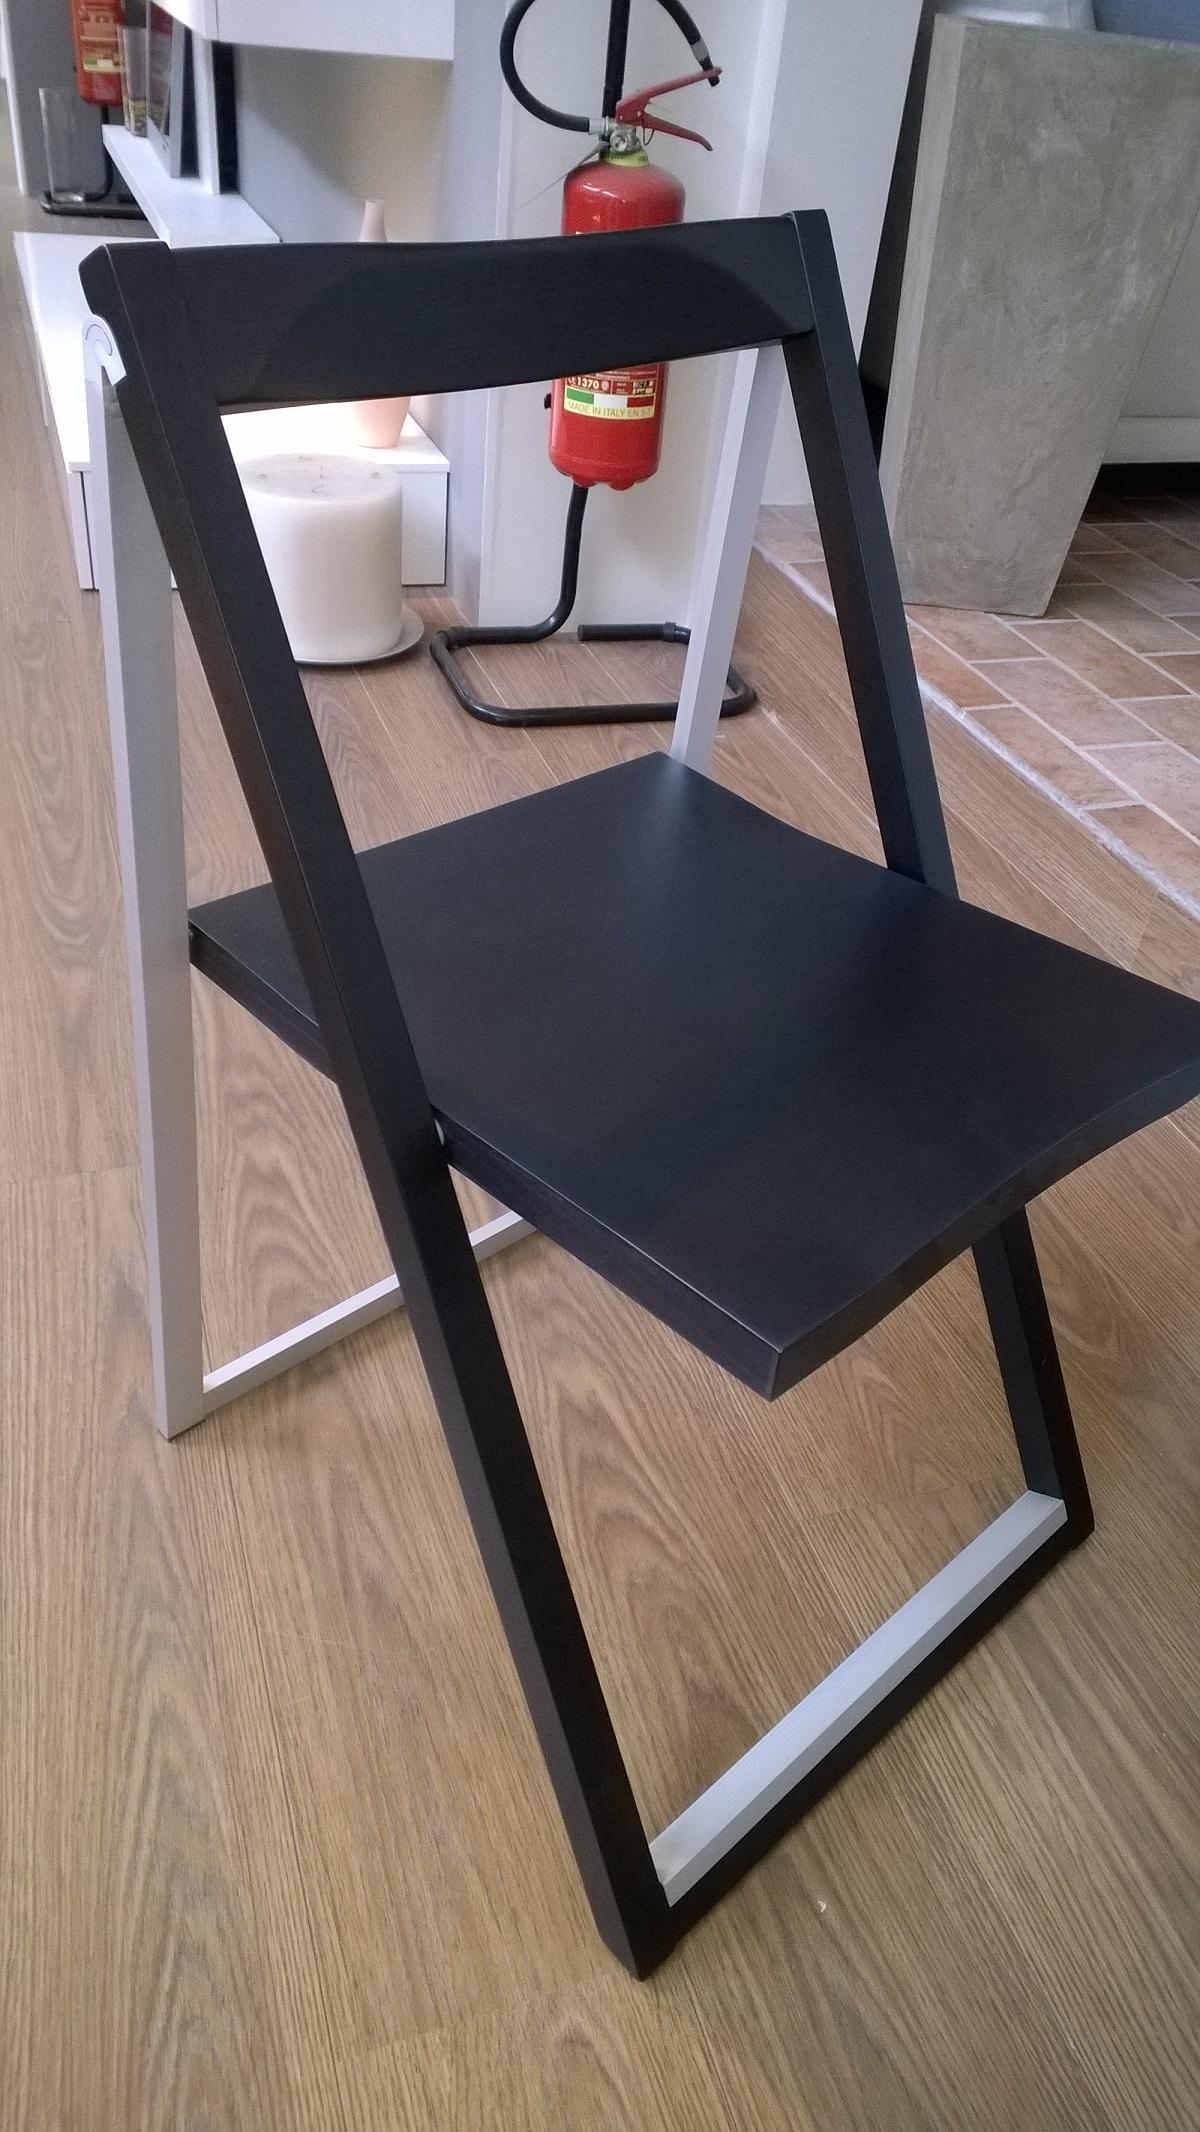 sedie in legno pieghevoli prezzi: compra sedie da giardino design ... - Sedie Cucina Scontate Calligaris